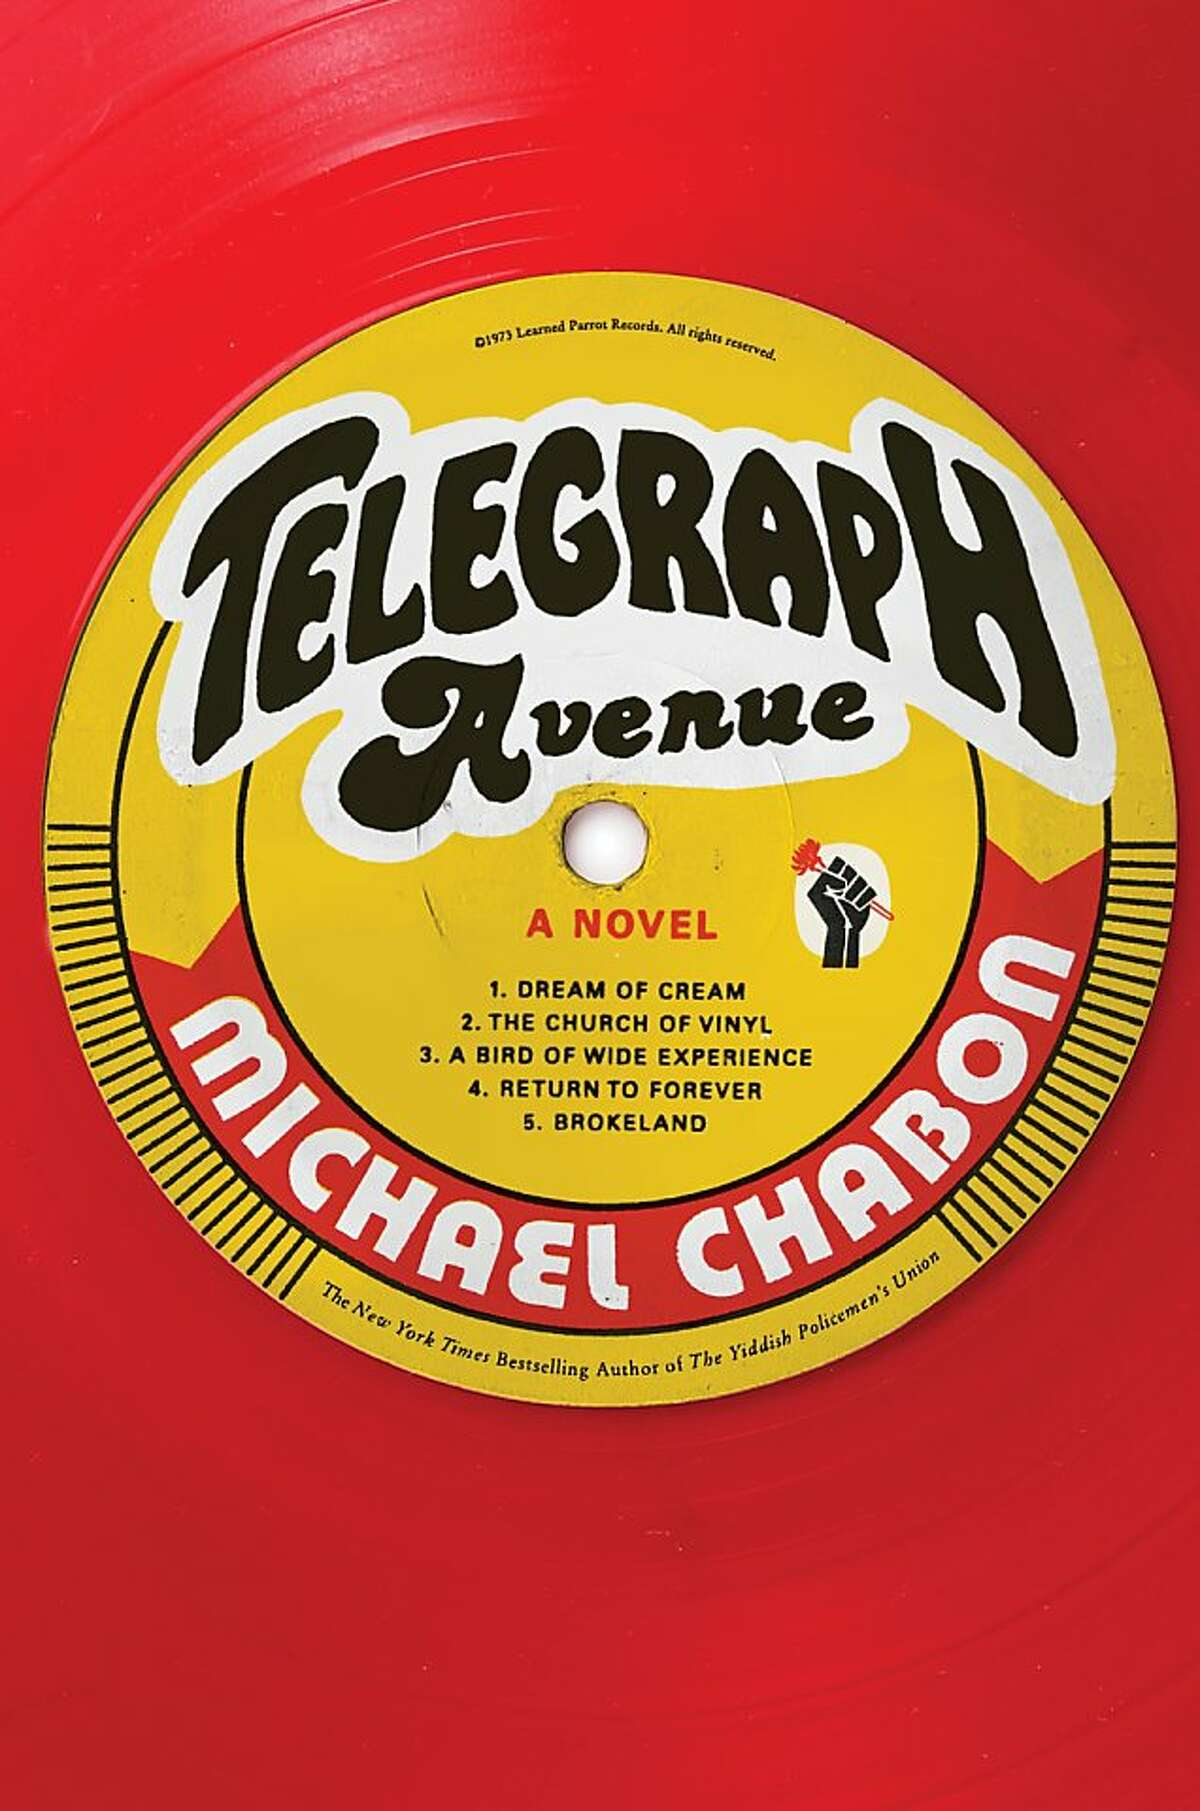 Telegraph Avenue, by Michael Chabon